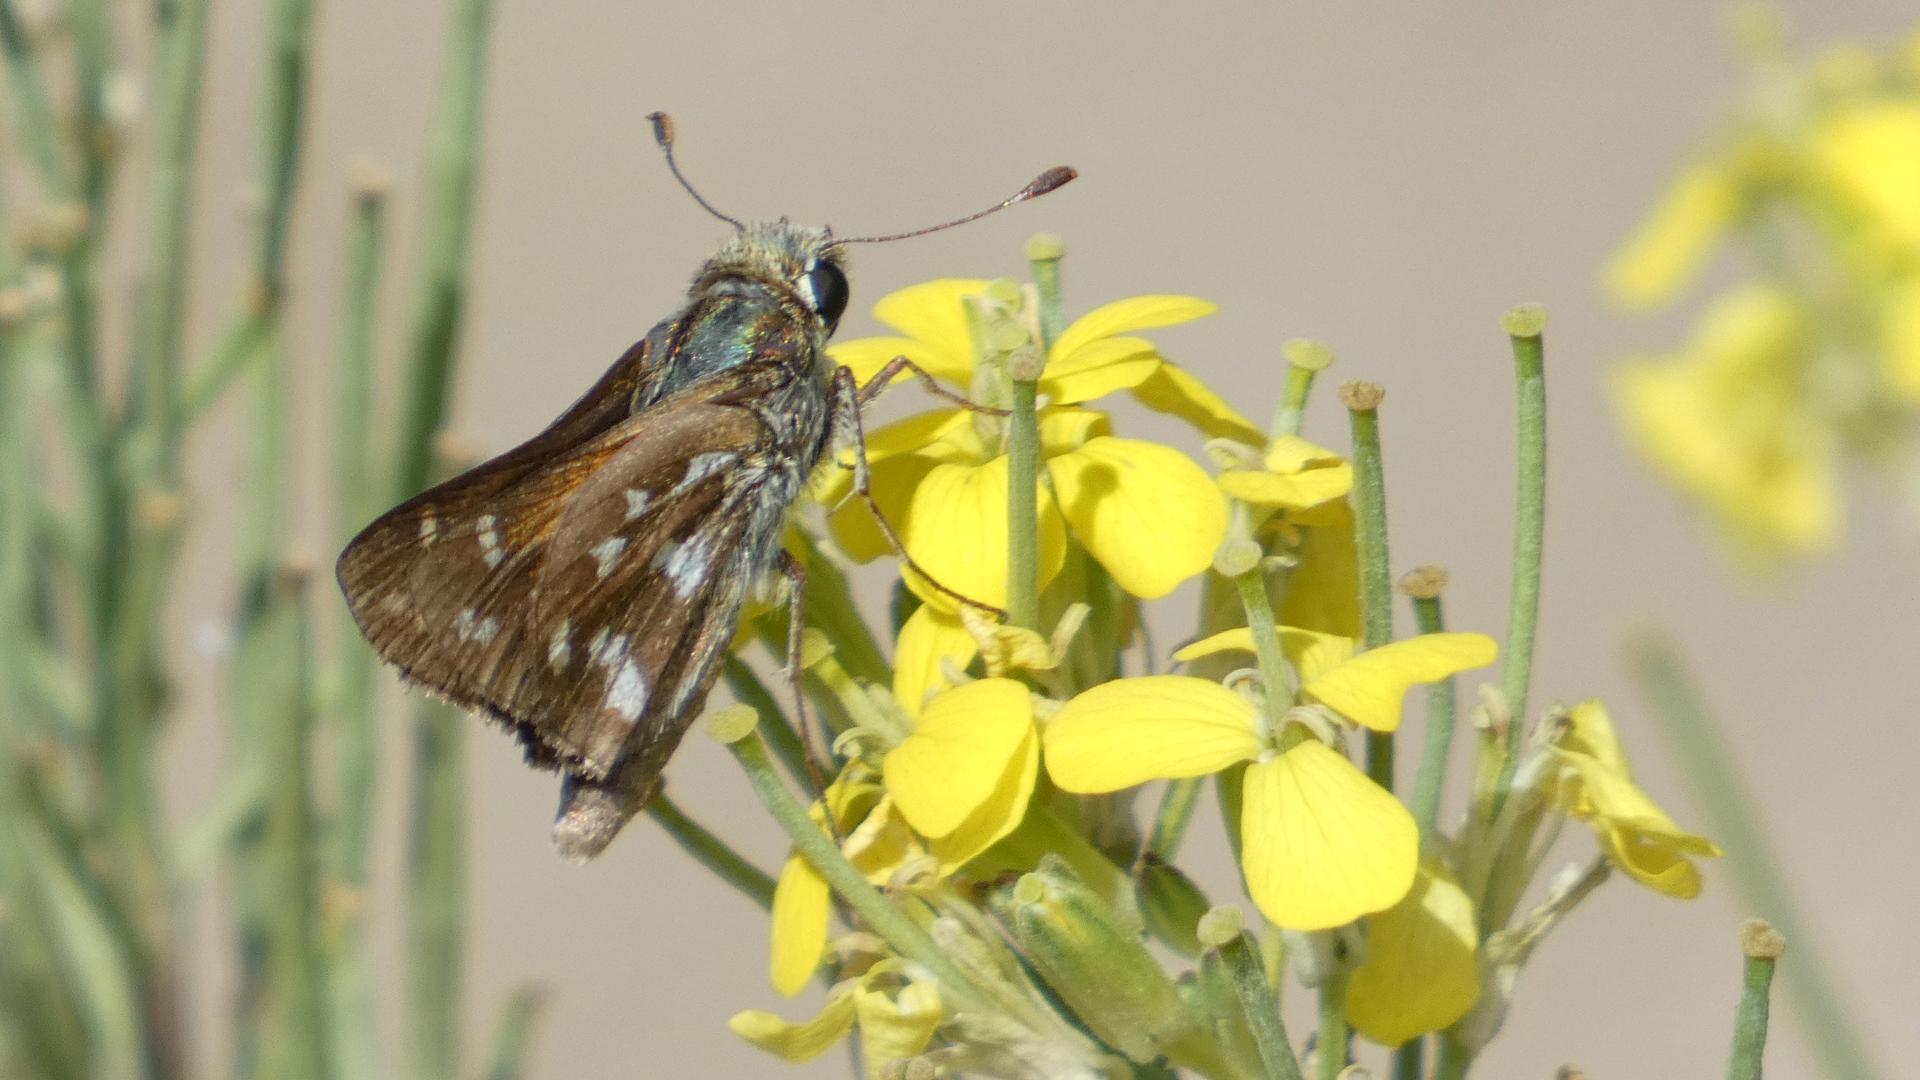 On western wallflower, Sandia Mountains west foothills, August 2021